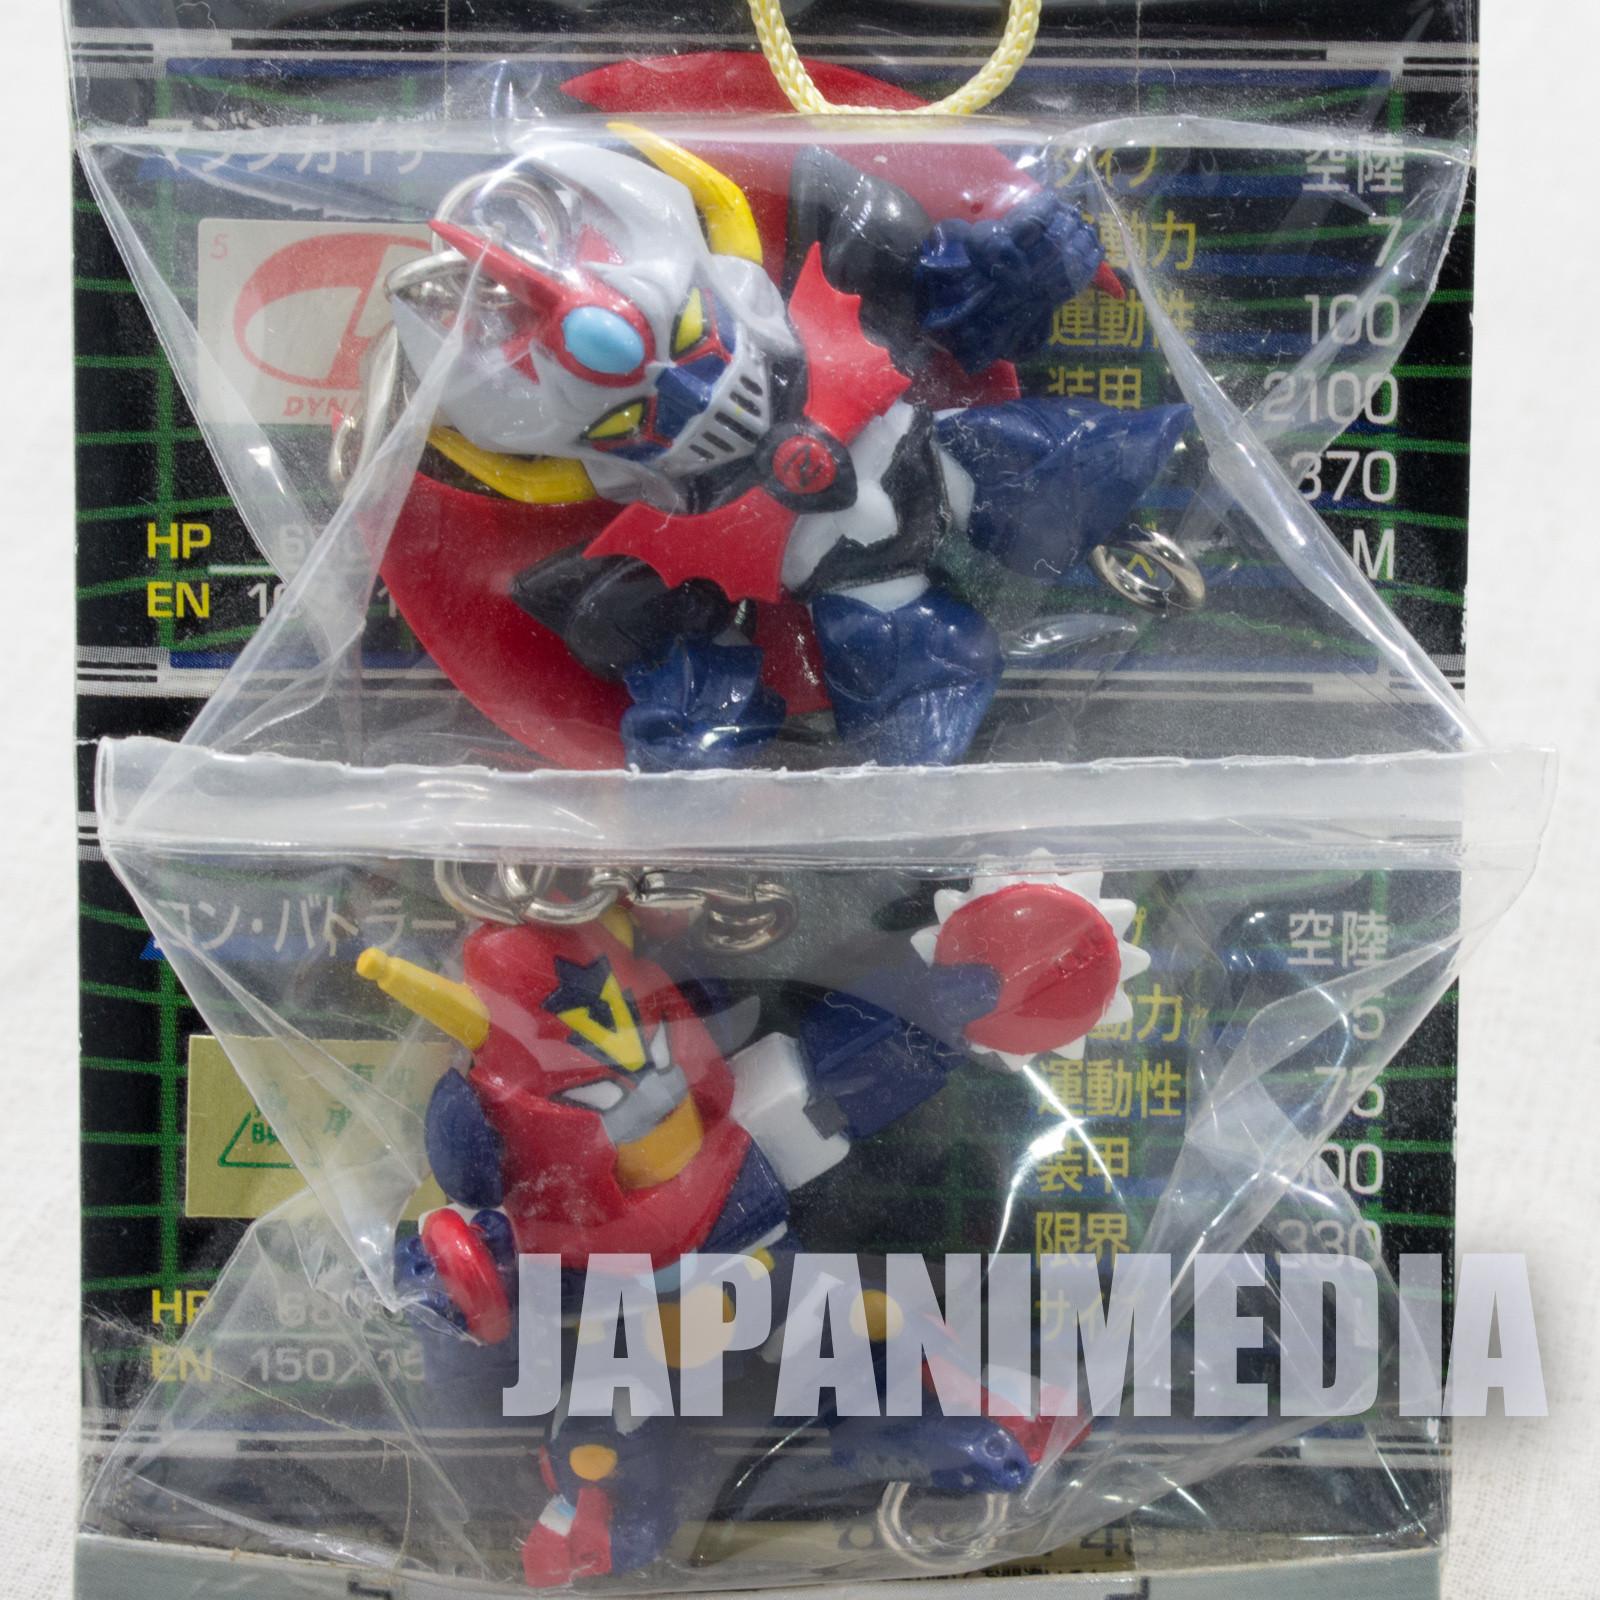 Super Robot Wars Mazinkaiser & Combattler V Joint Figure Collection JAPAN